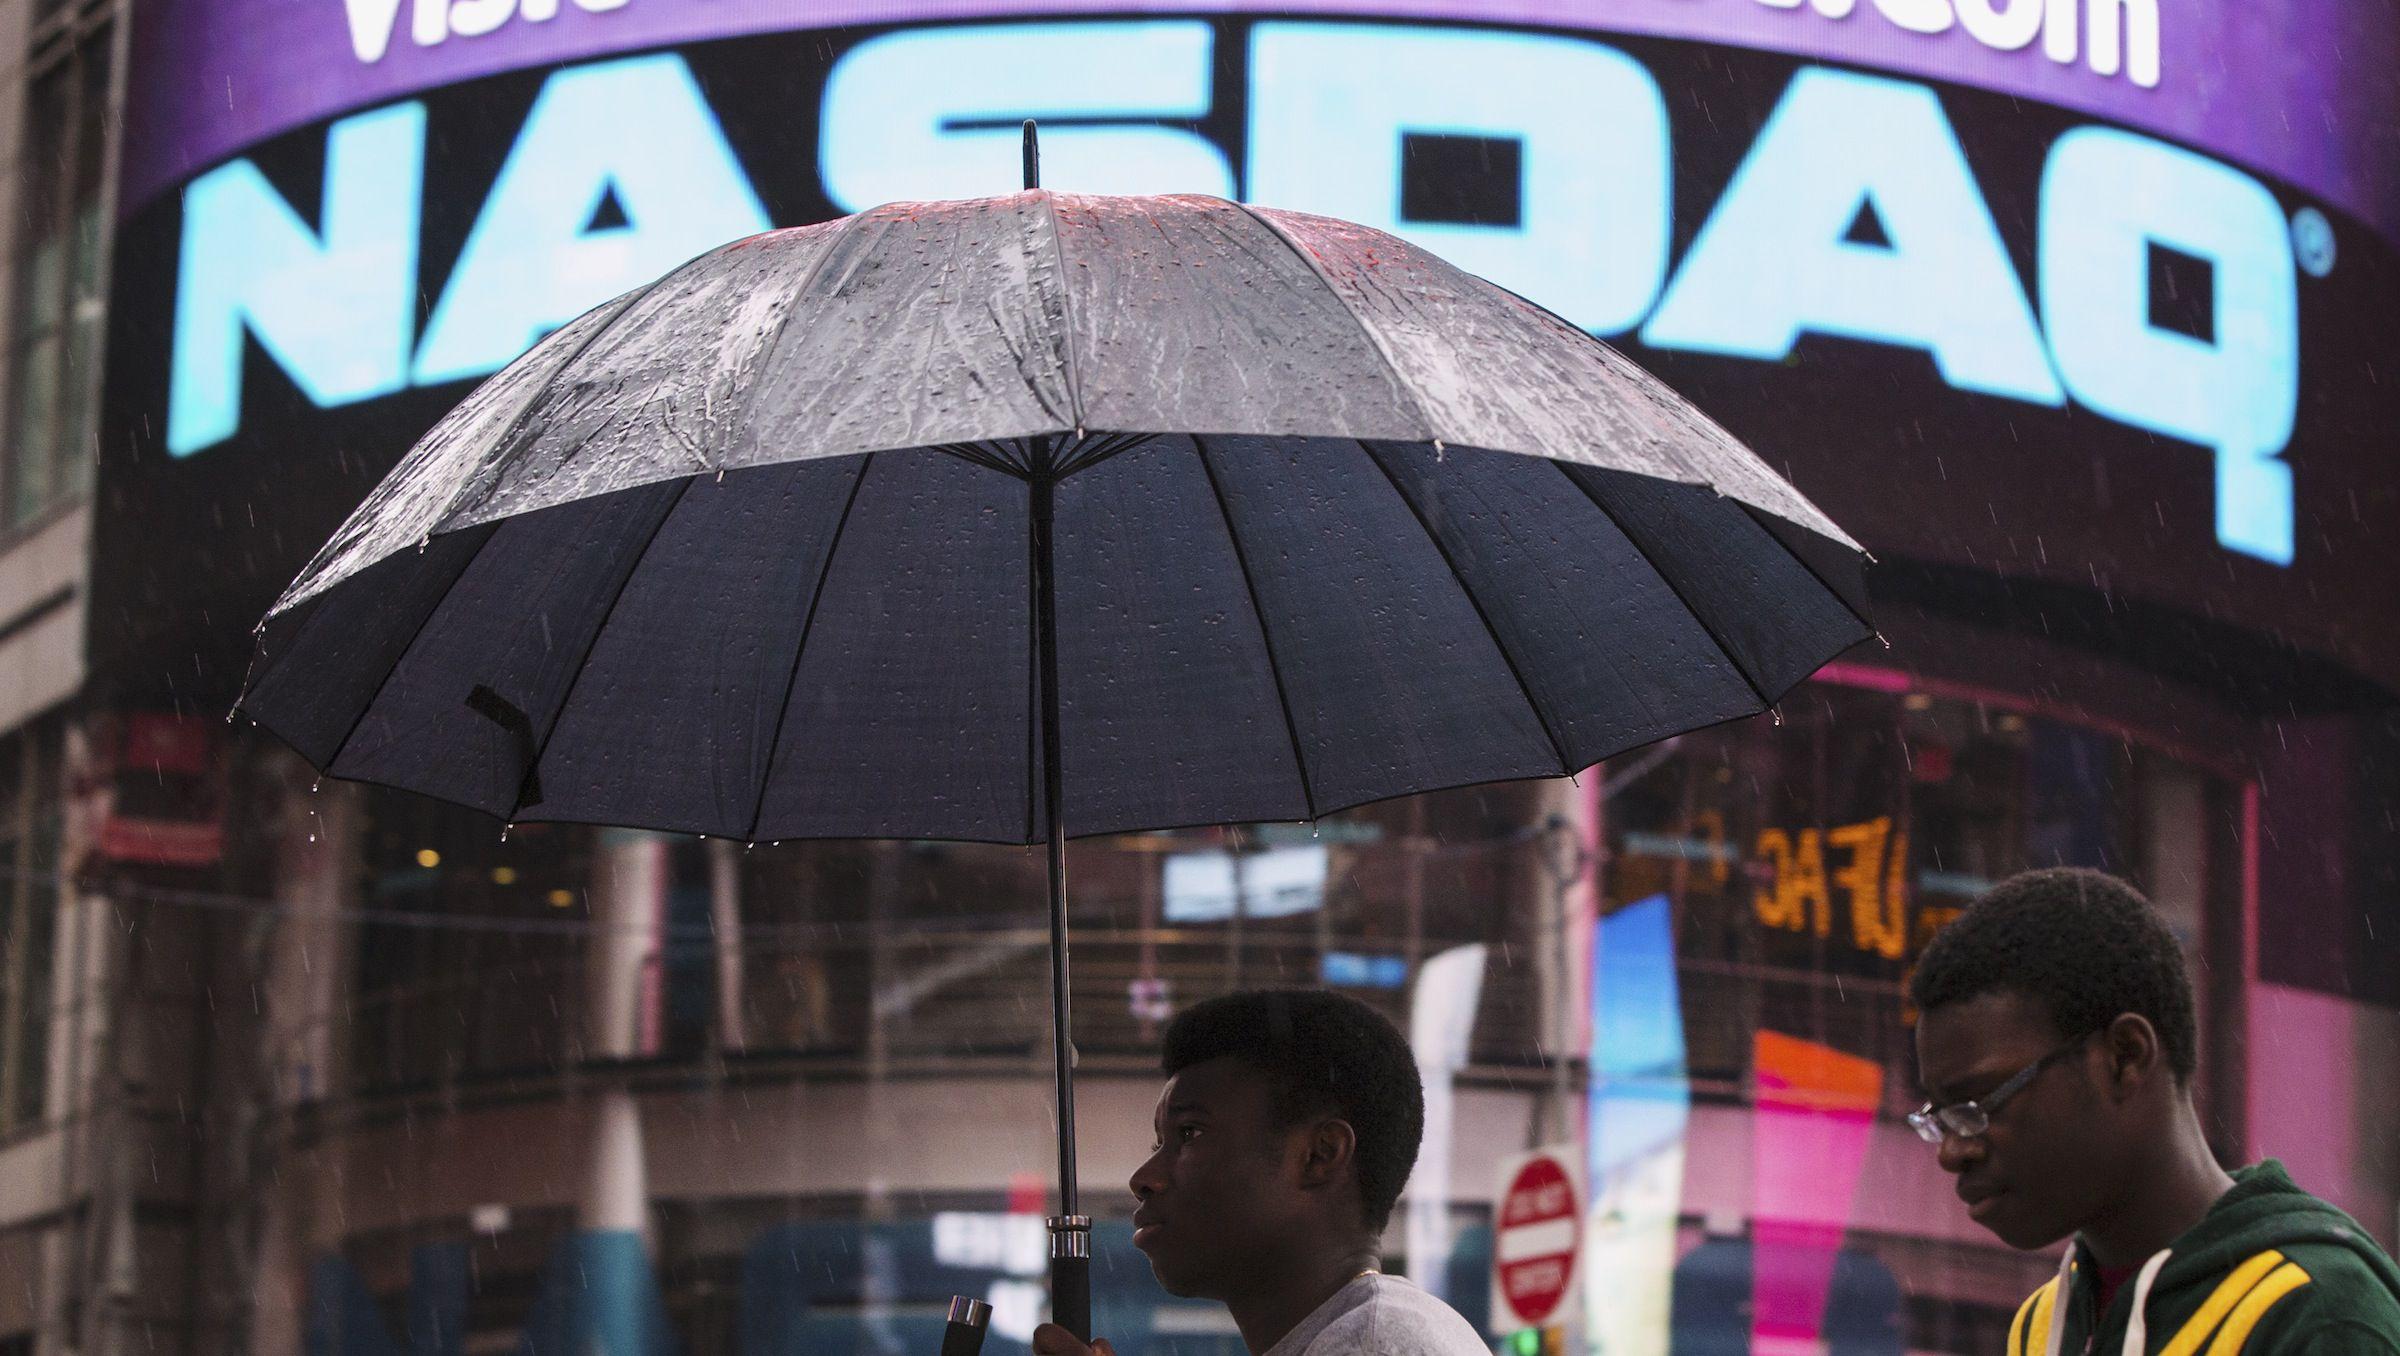 Rainy day at Nasdaq headquarters